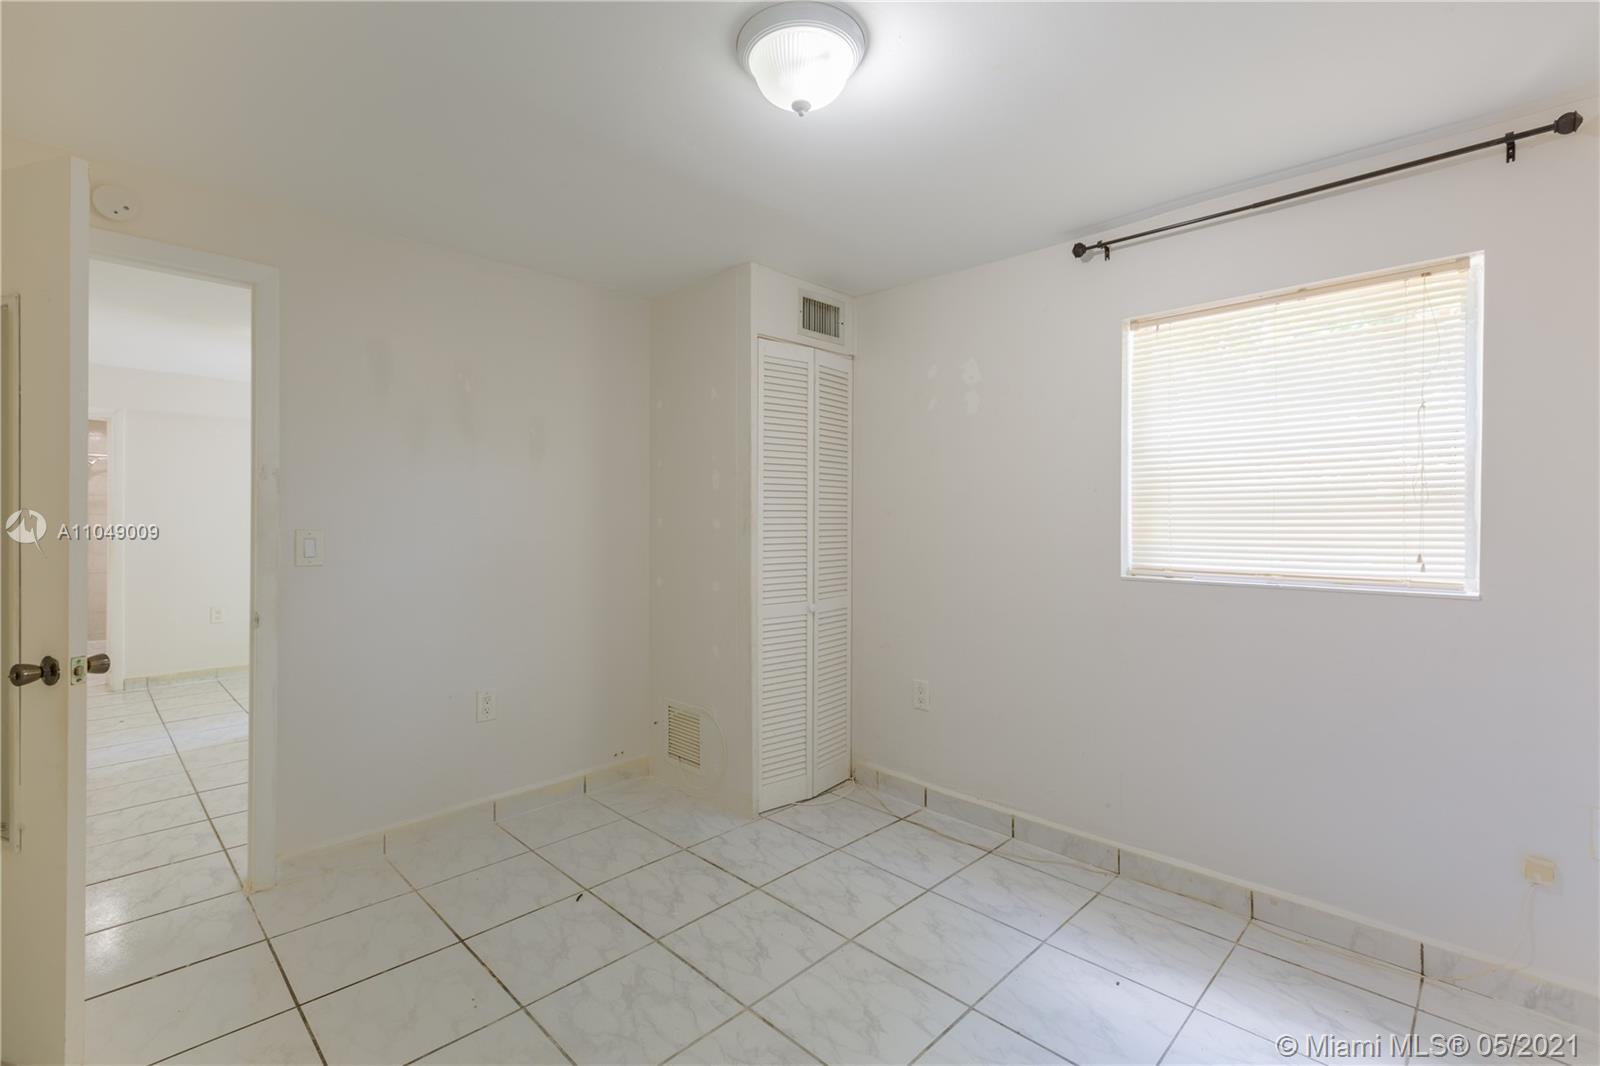 /  2698 sq. ft. $ 2021-05-28 0 Photo